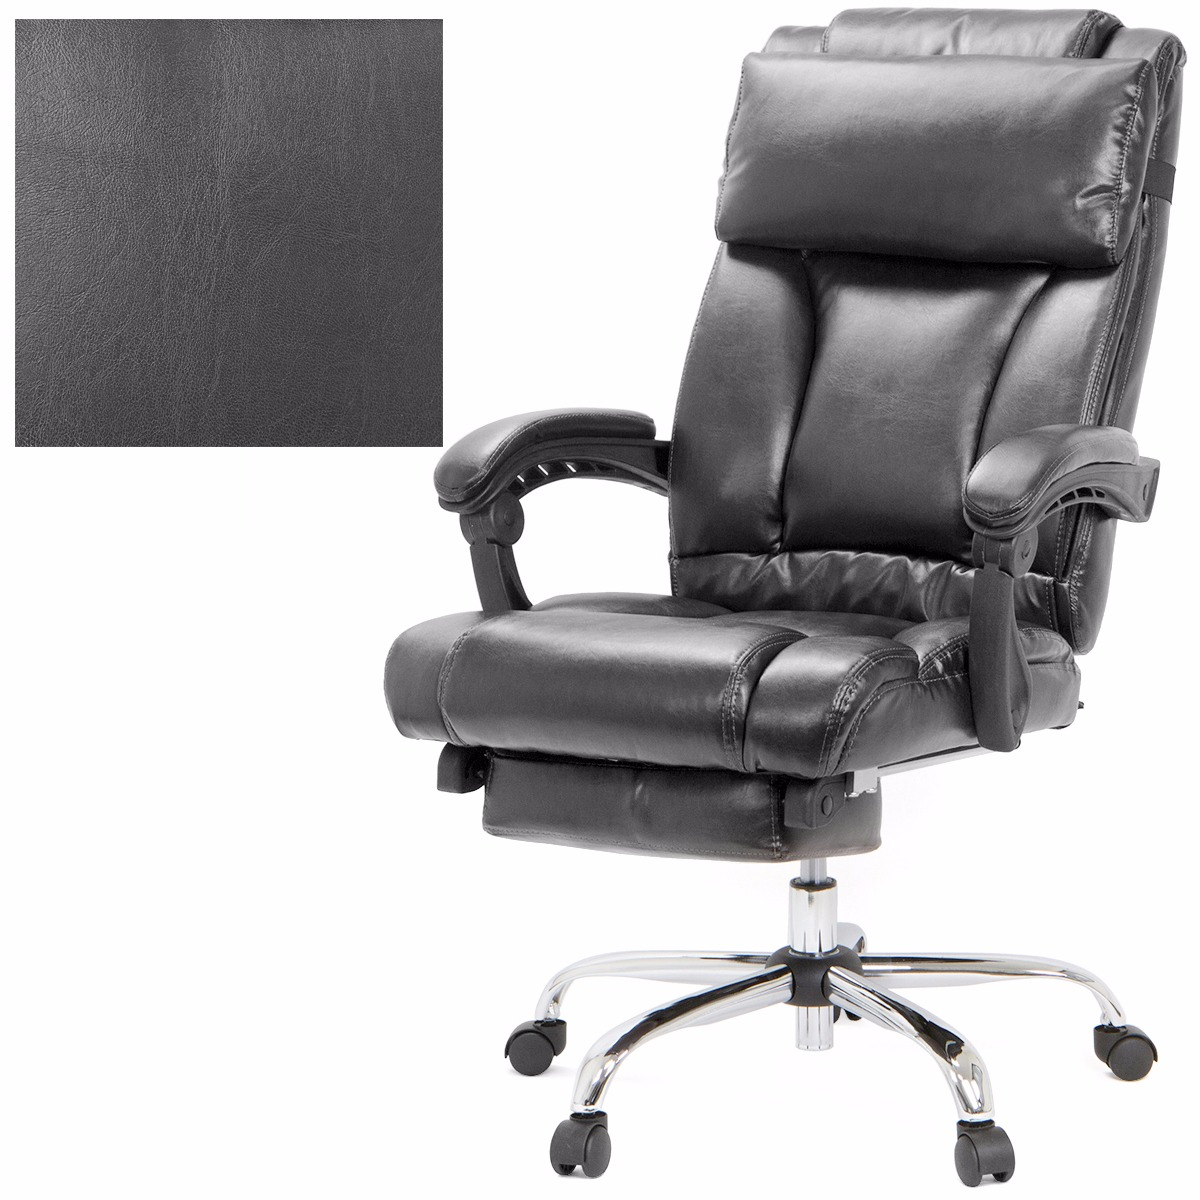 Barton Executive Reclining Office Chair Ergonomic High Back Leather ...